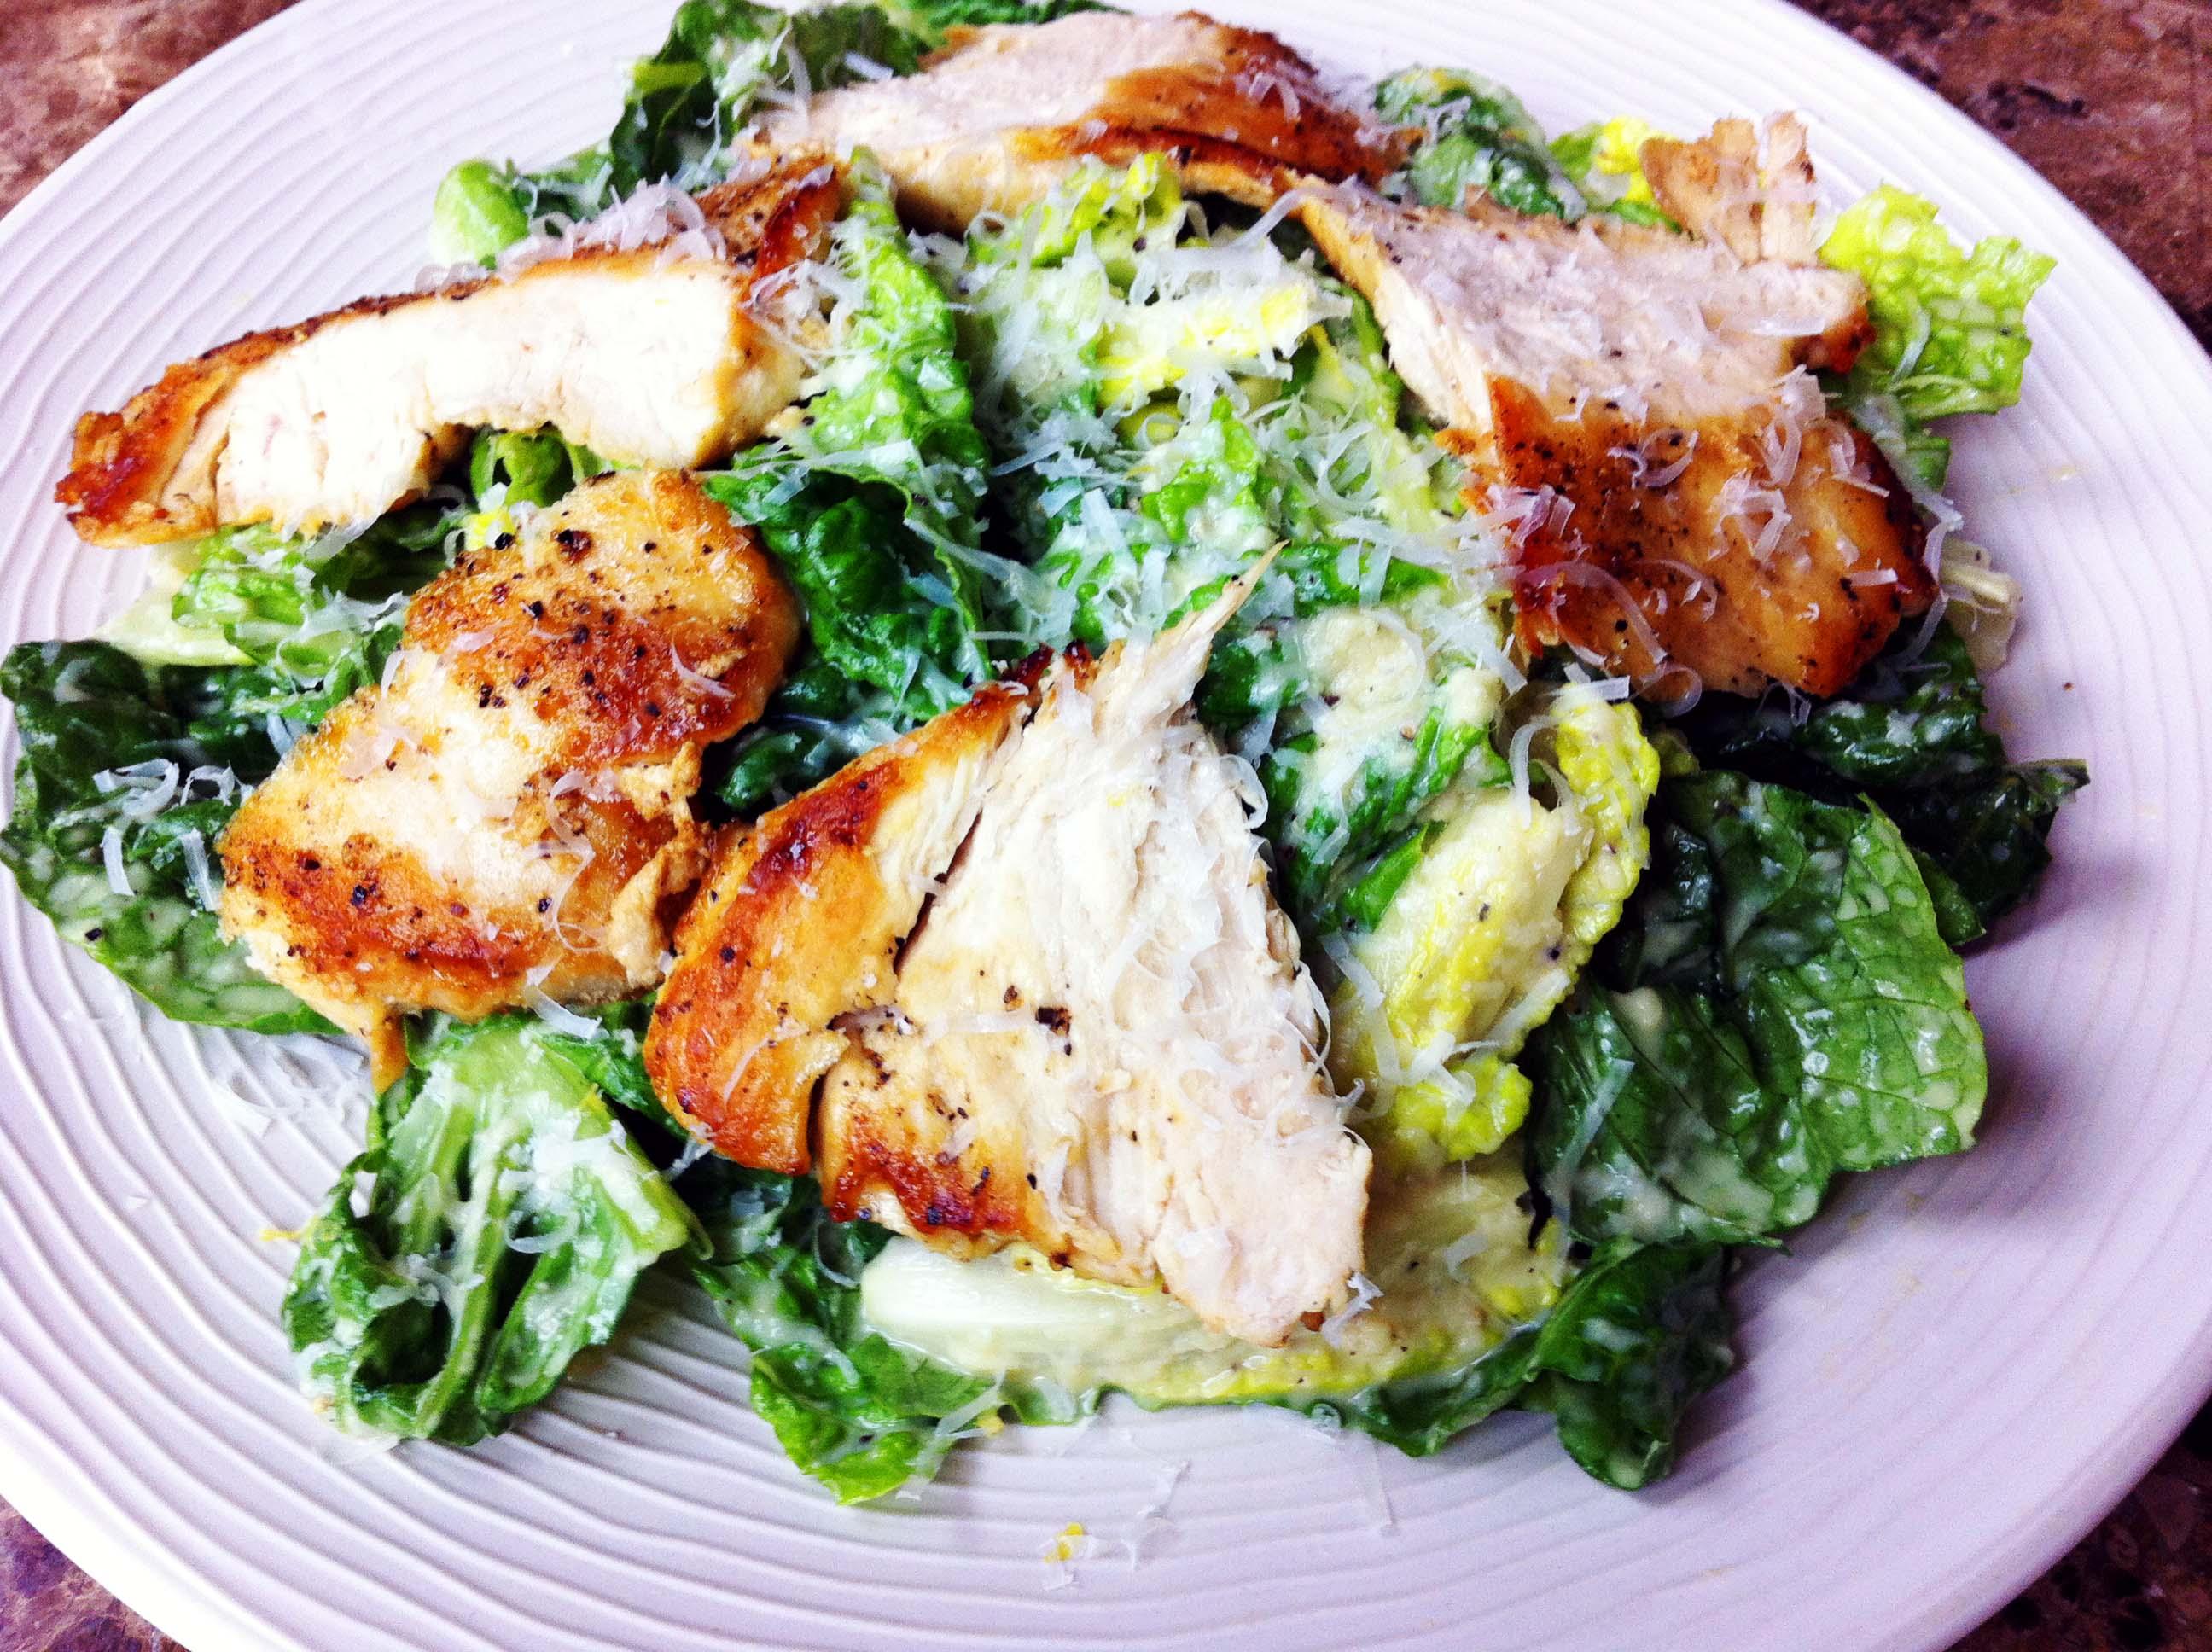 Salad with Chicken : Caesar Salad : Chicken Caesar Salad with Homemade Dressing : Salad Recipes